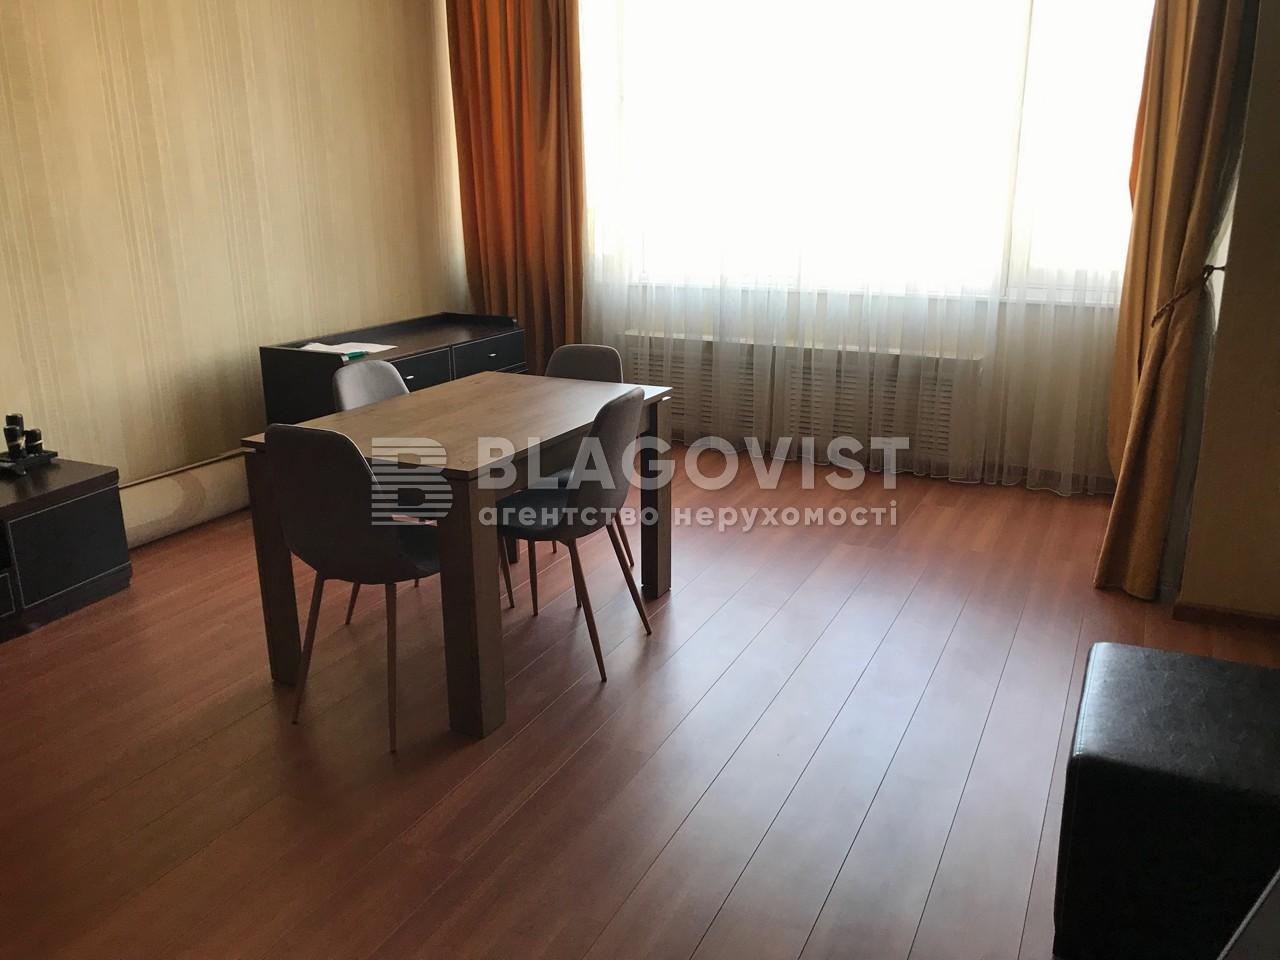 Квартира H-36703, Шевченко Тараса бульв., 33б, Киев - Фото 5